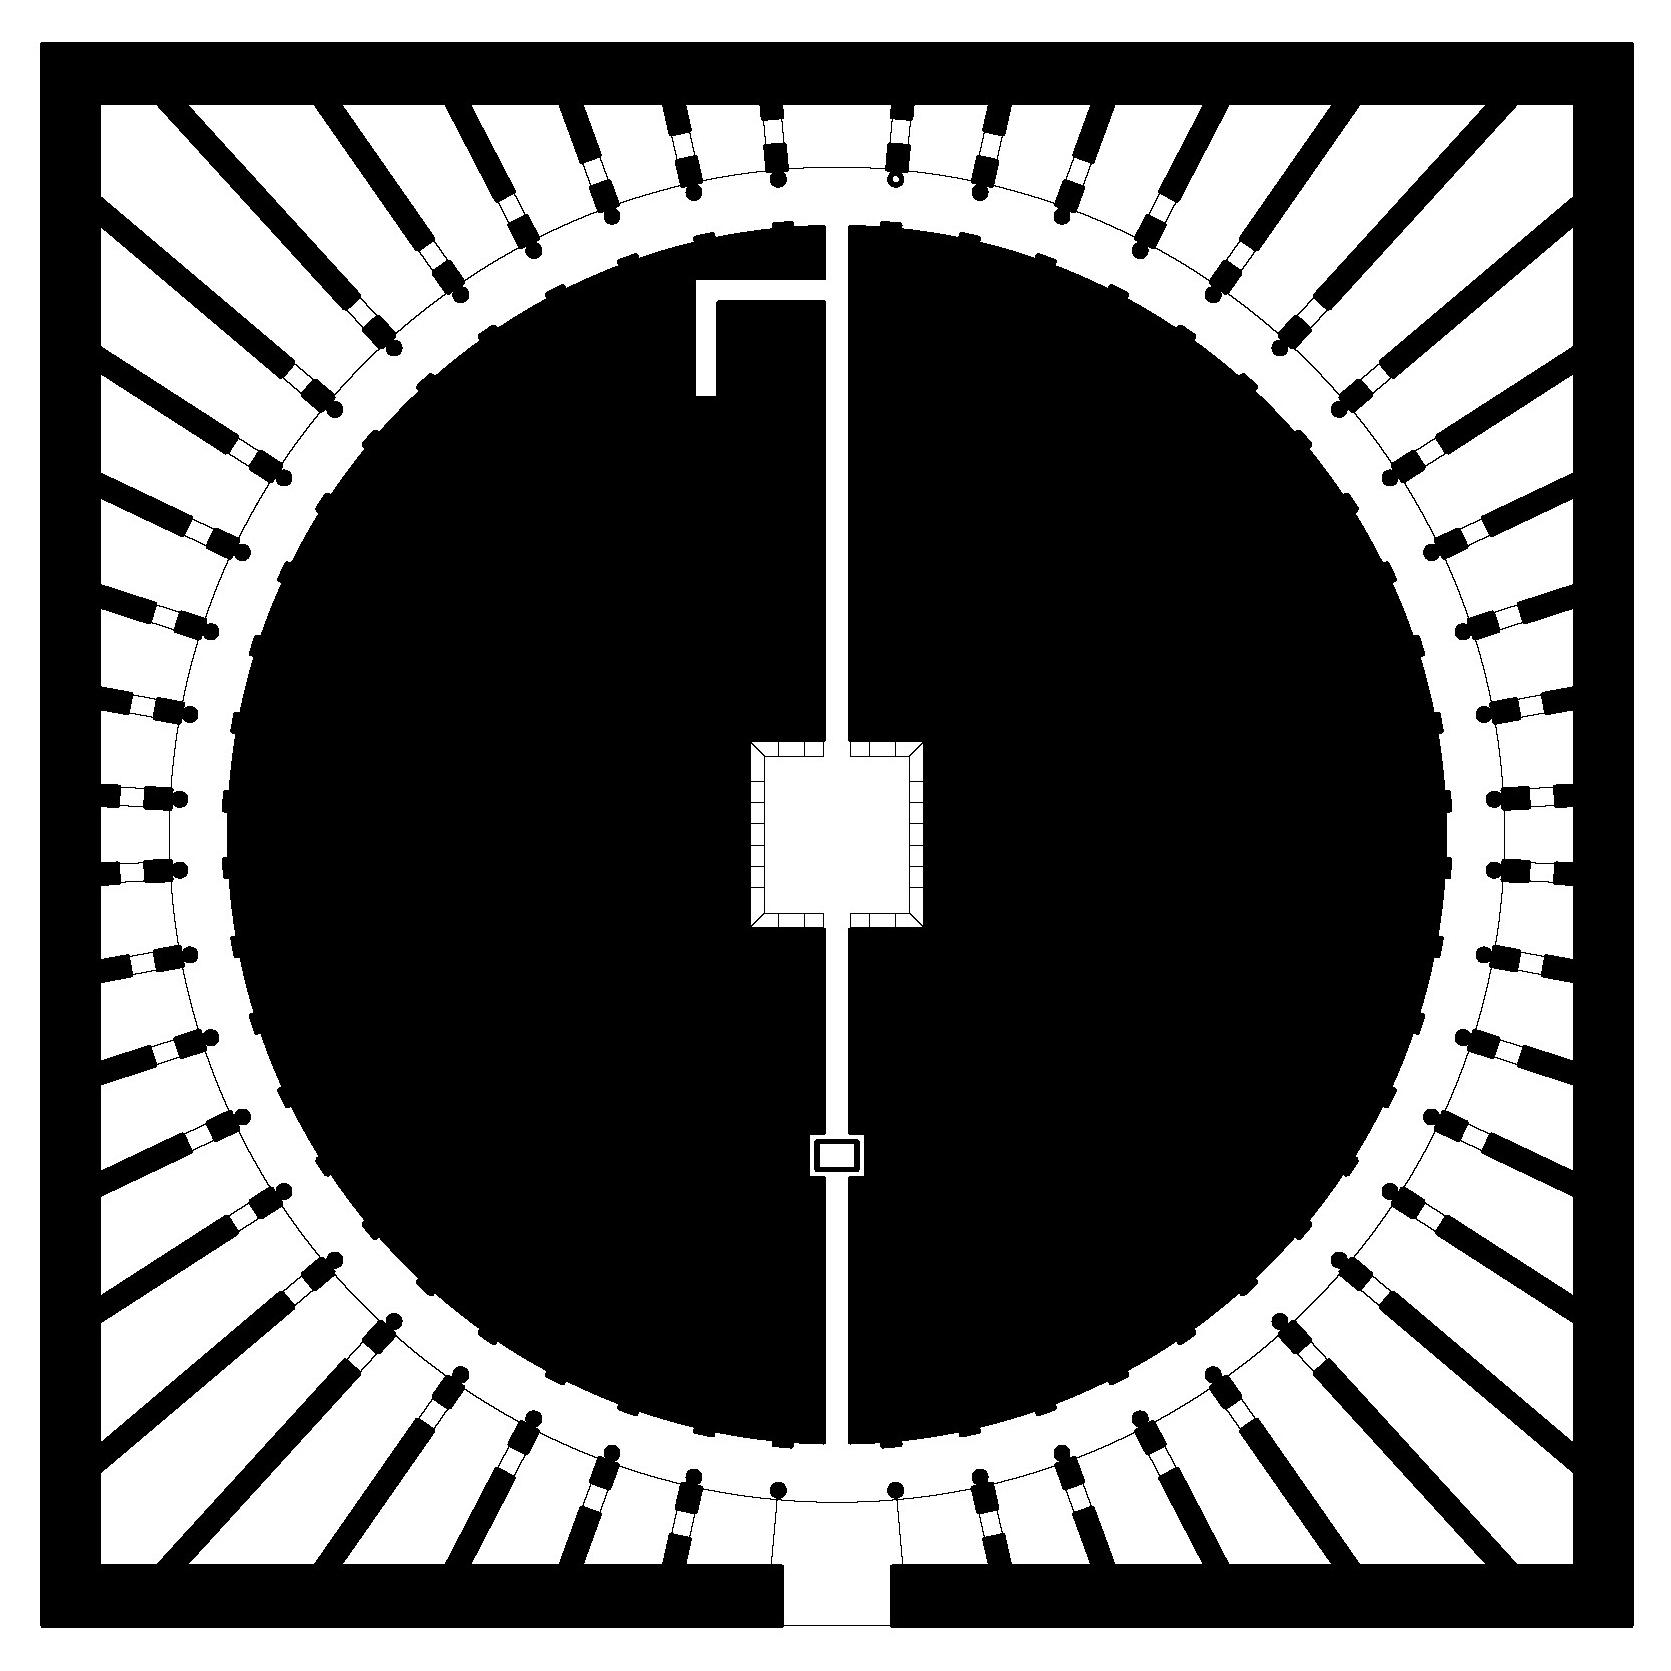 Circle Plans_hadrian.jpg